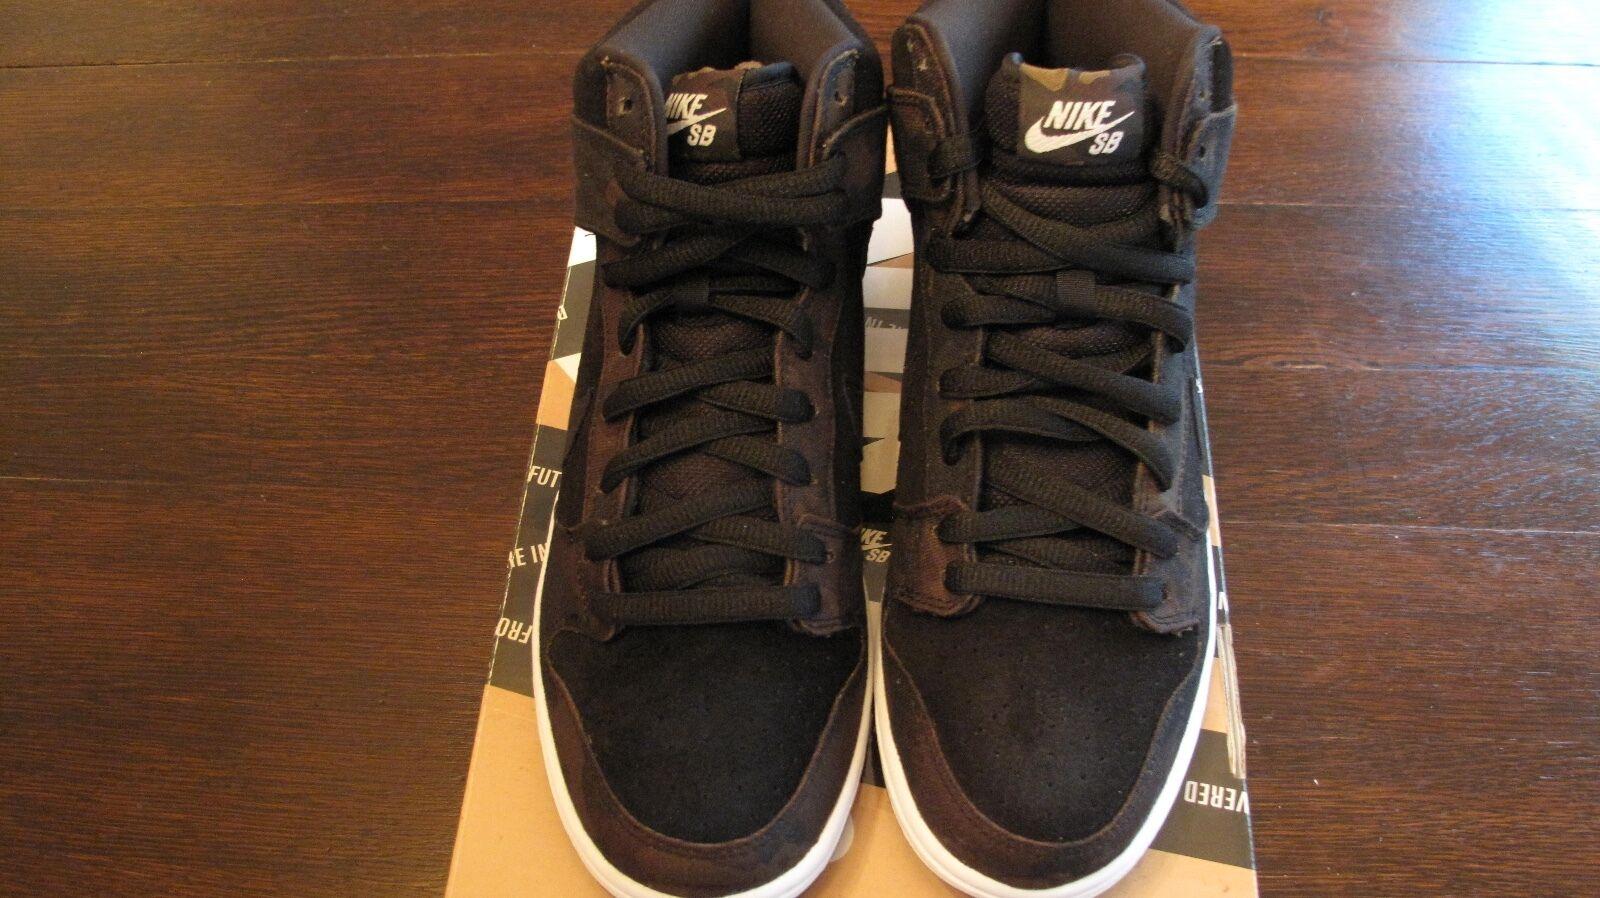 Mens Nike Dunk High Pro SB Size 8.5, Iguana-Black